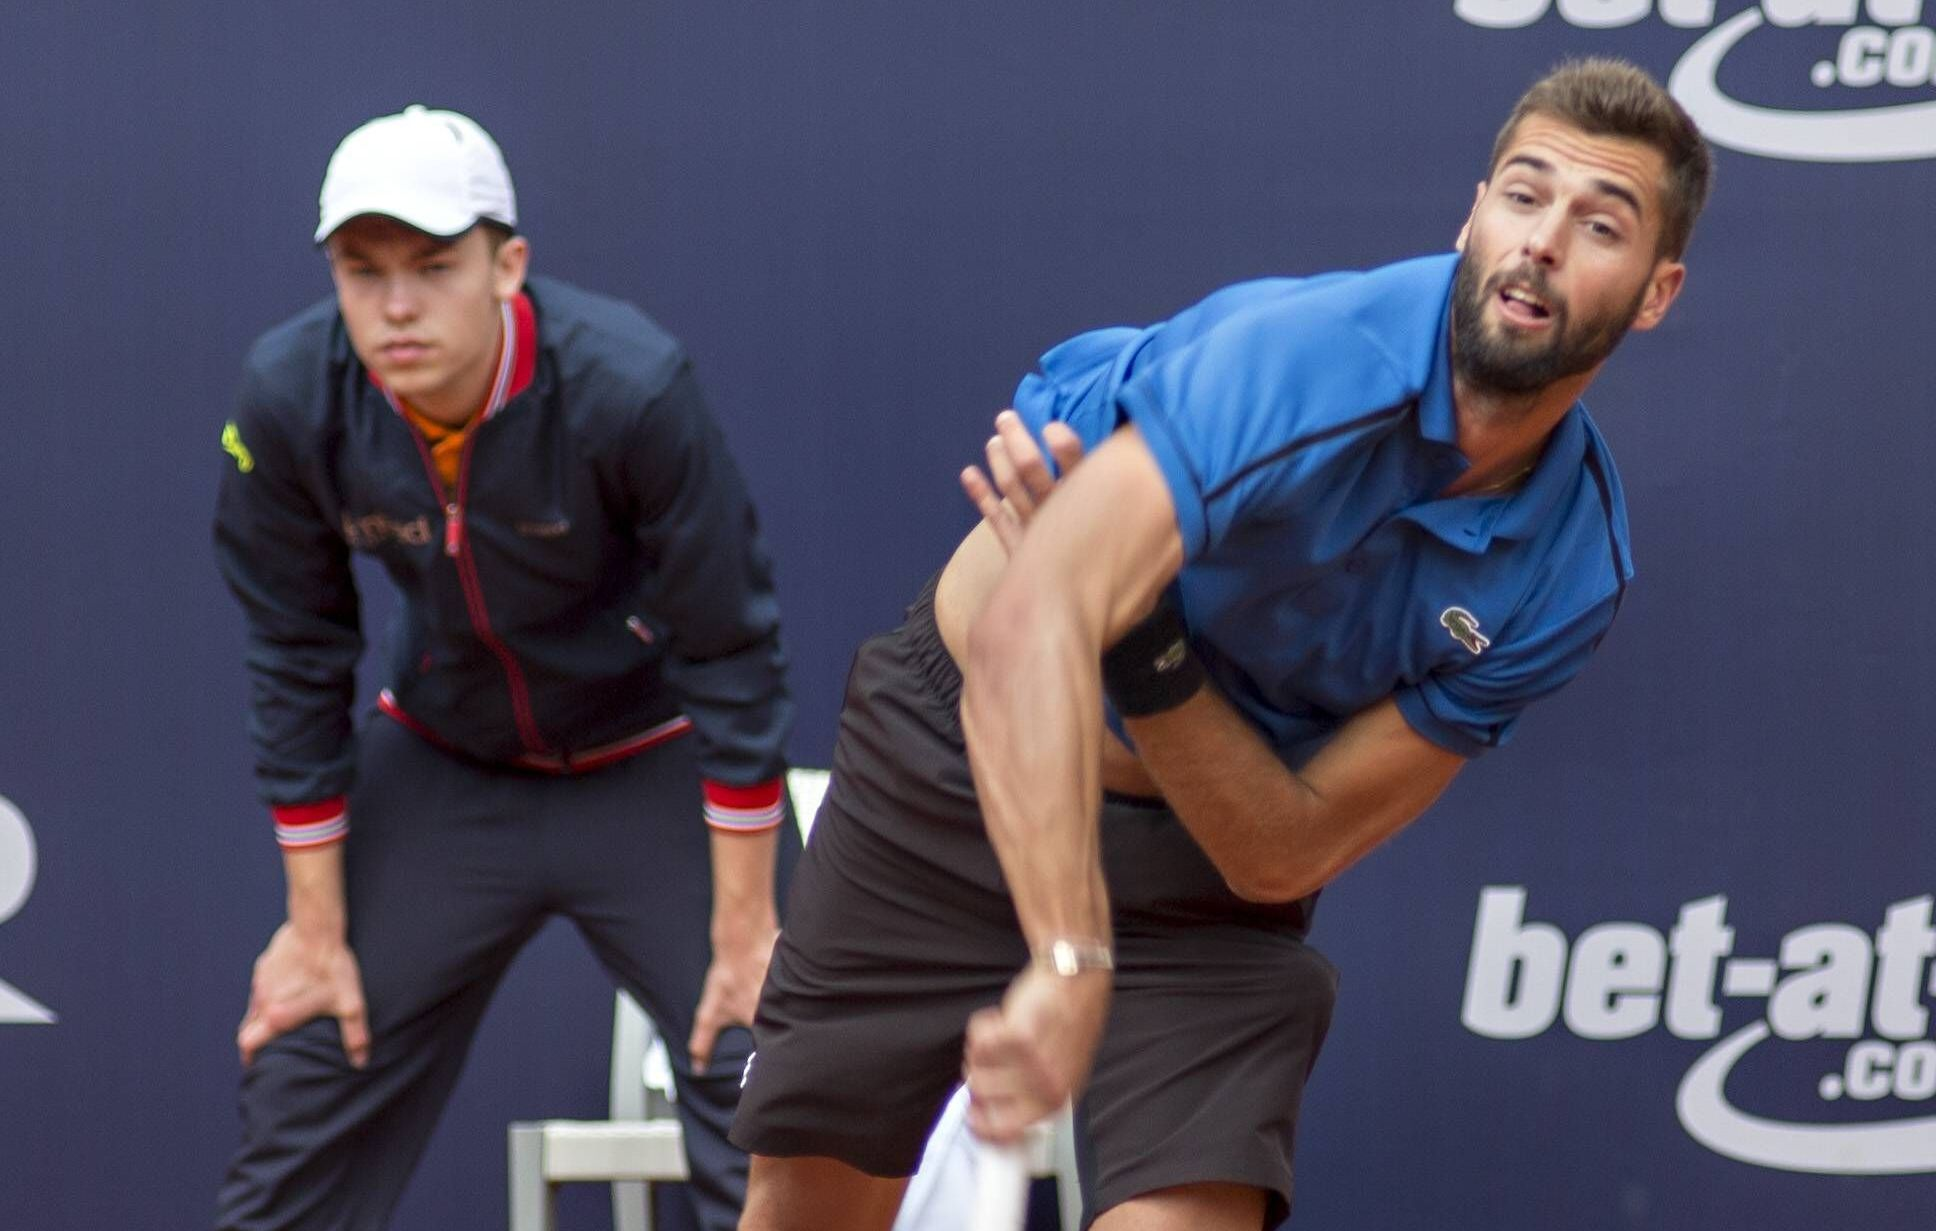 Tennis - ATP - Djokovic et Nadal s?offrent Paire et Chardy